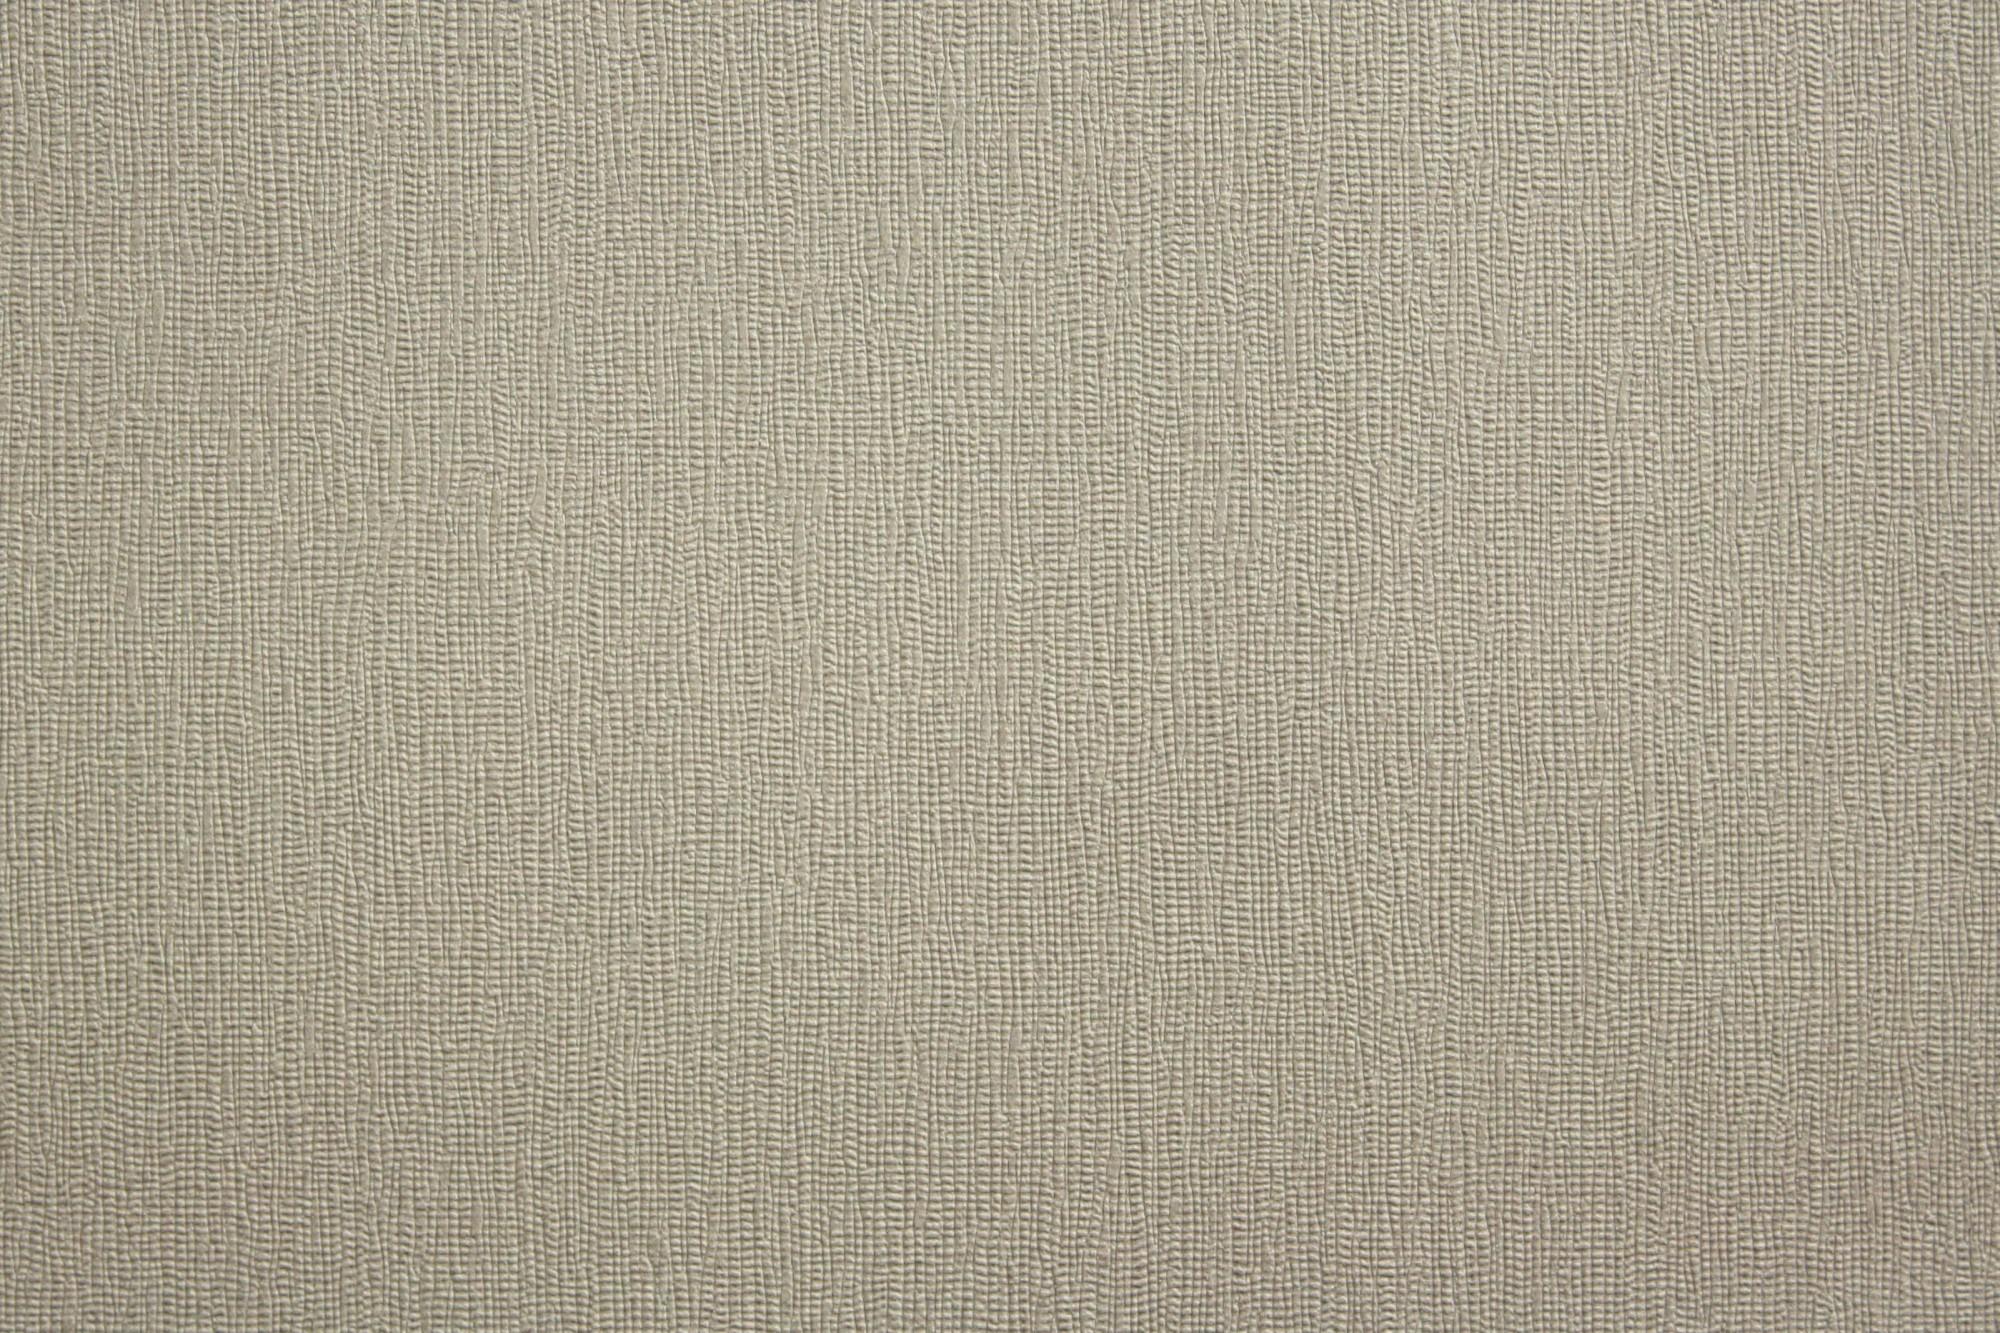 tapete rasch seduction vliestapete 796339 uni grau. Black Bedroom Furniture Sets. Home Design Ideas